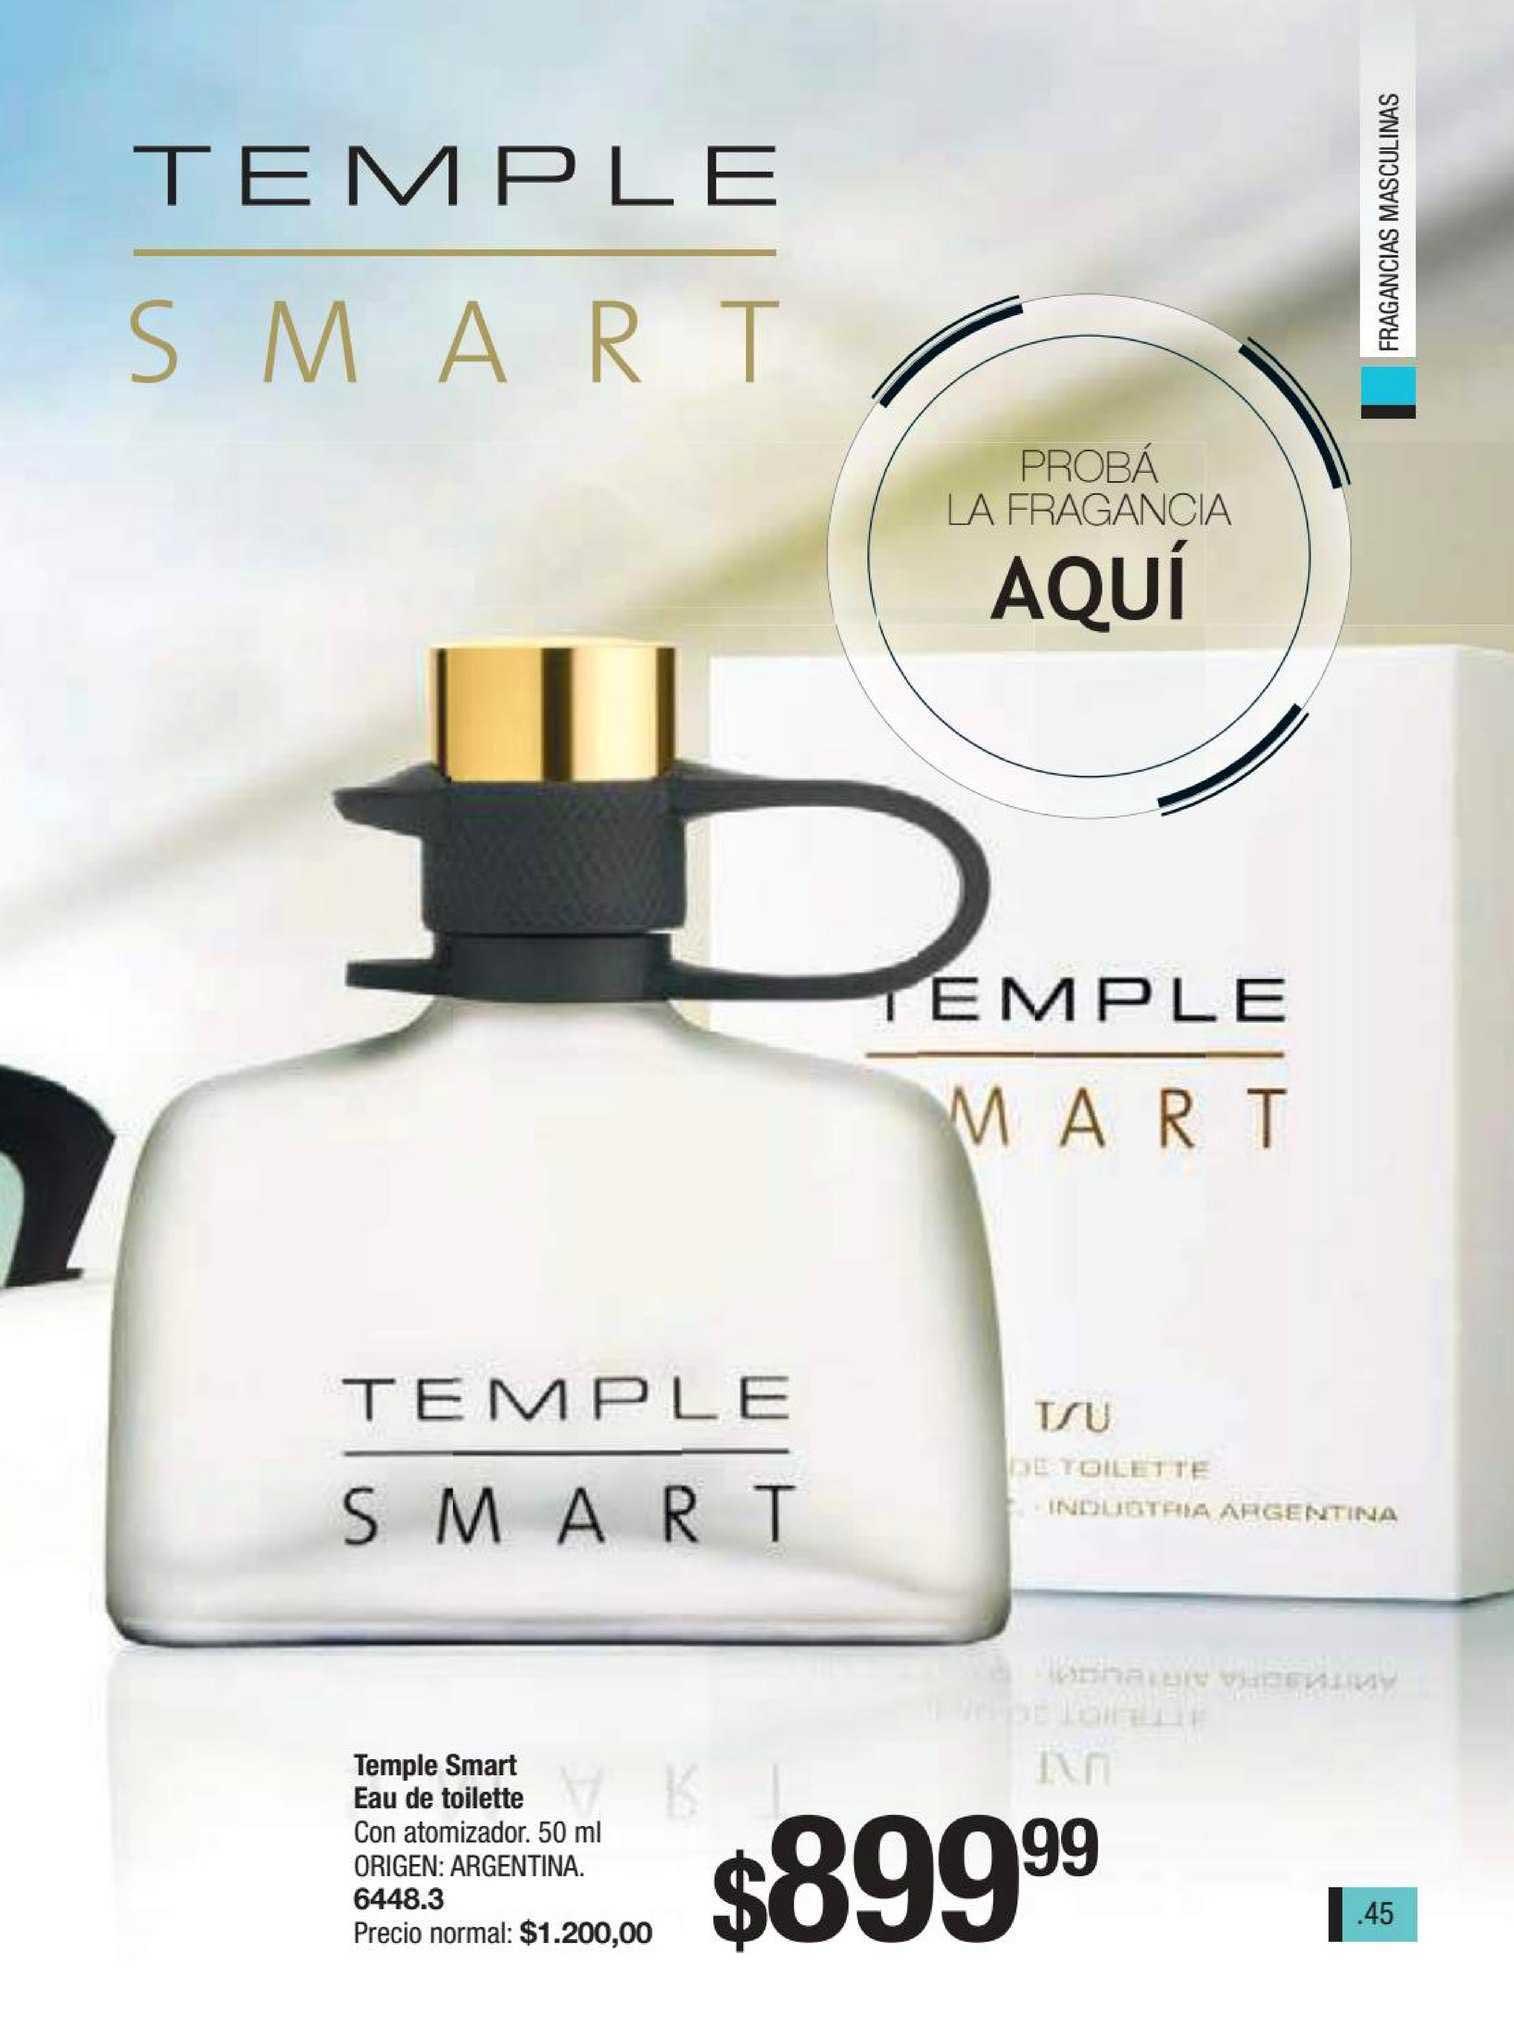 Tsu Cosmeticos Temple Smart Eau De Toilette